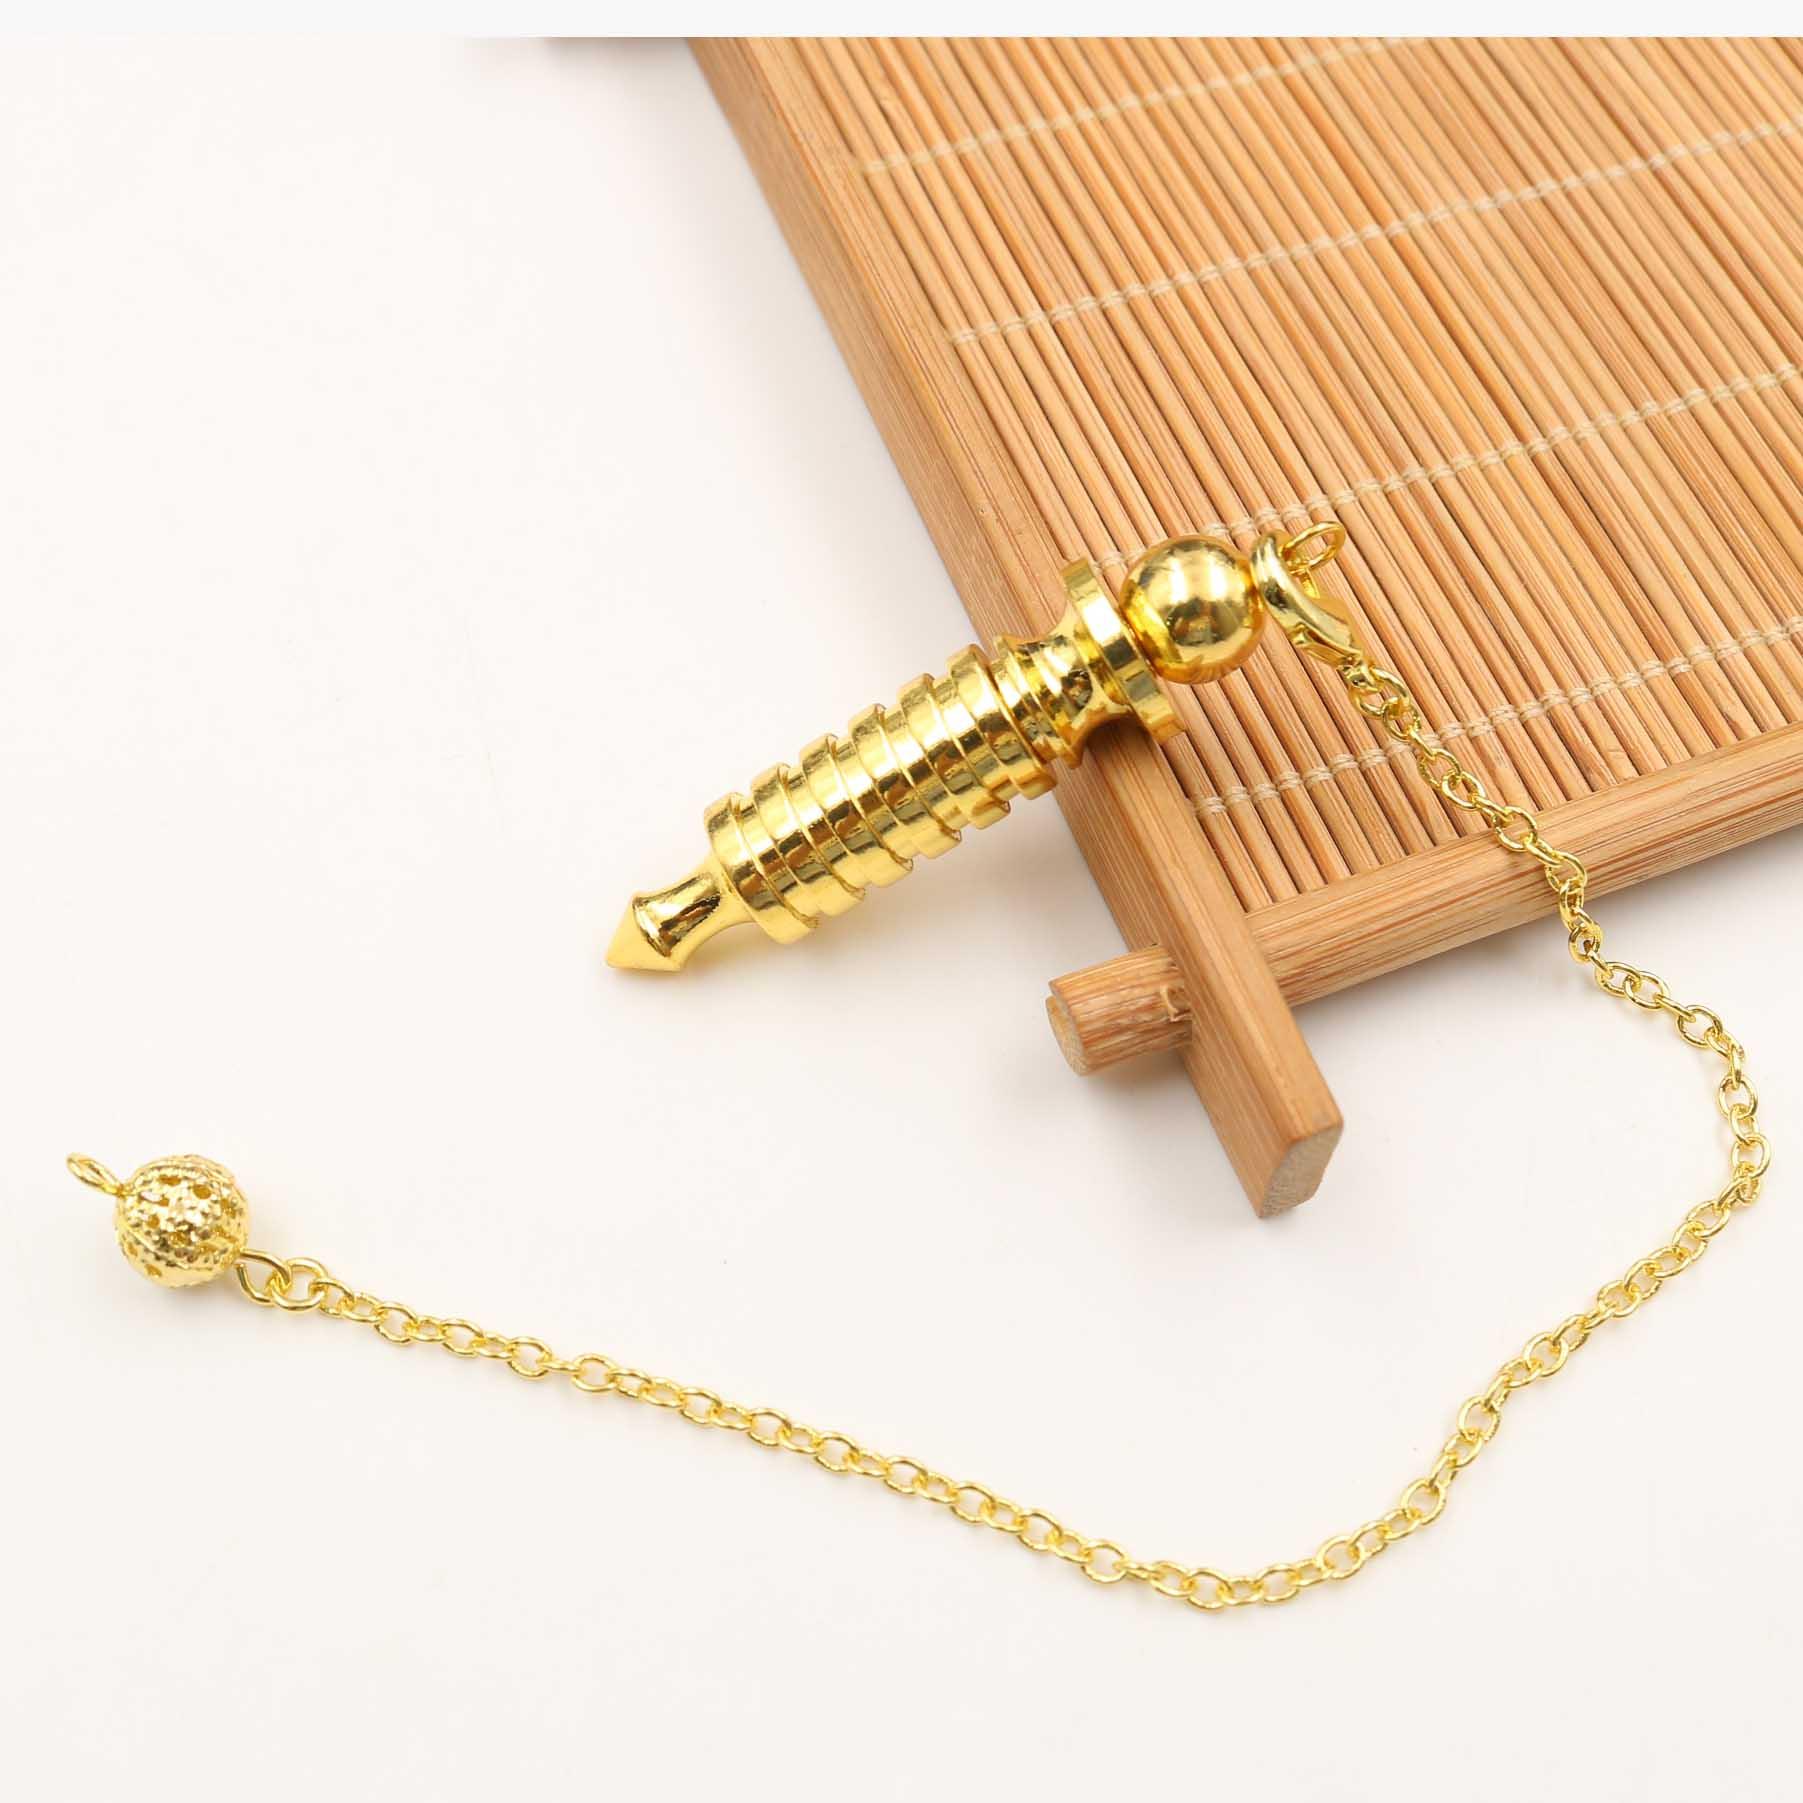 Metal Pendulums for Dowsing Divination Reiki Healing Spiritual Wicca Women Men Amulet Screw Shape Pendule Chains Charm Jewelry 7